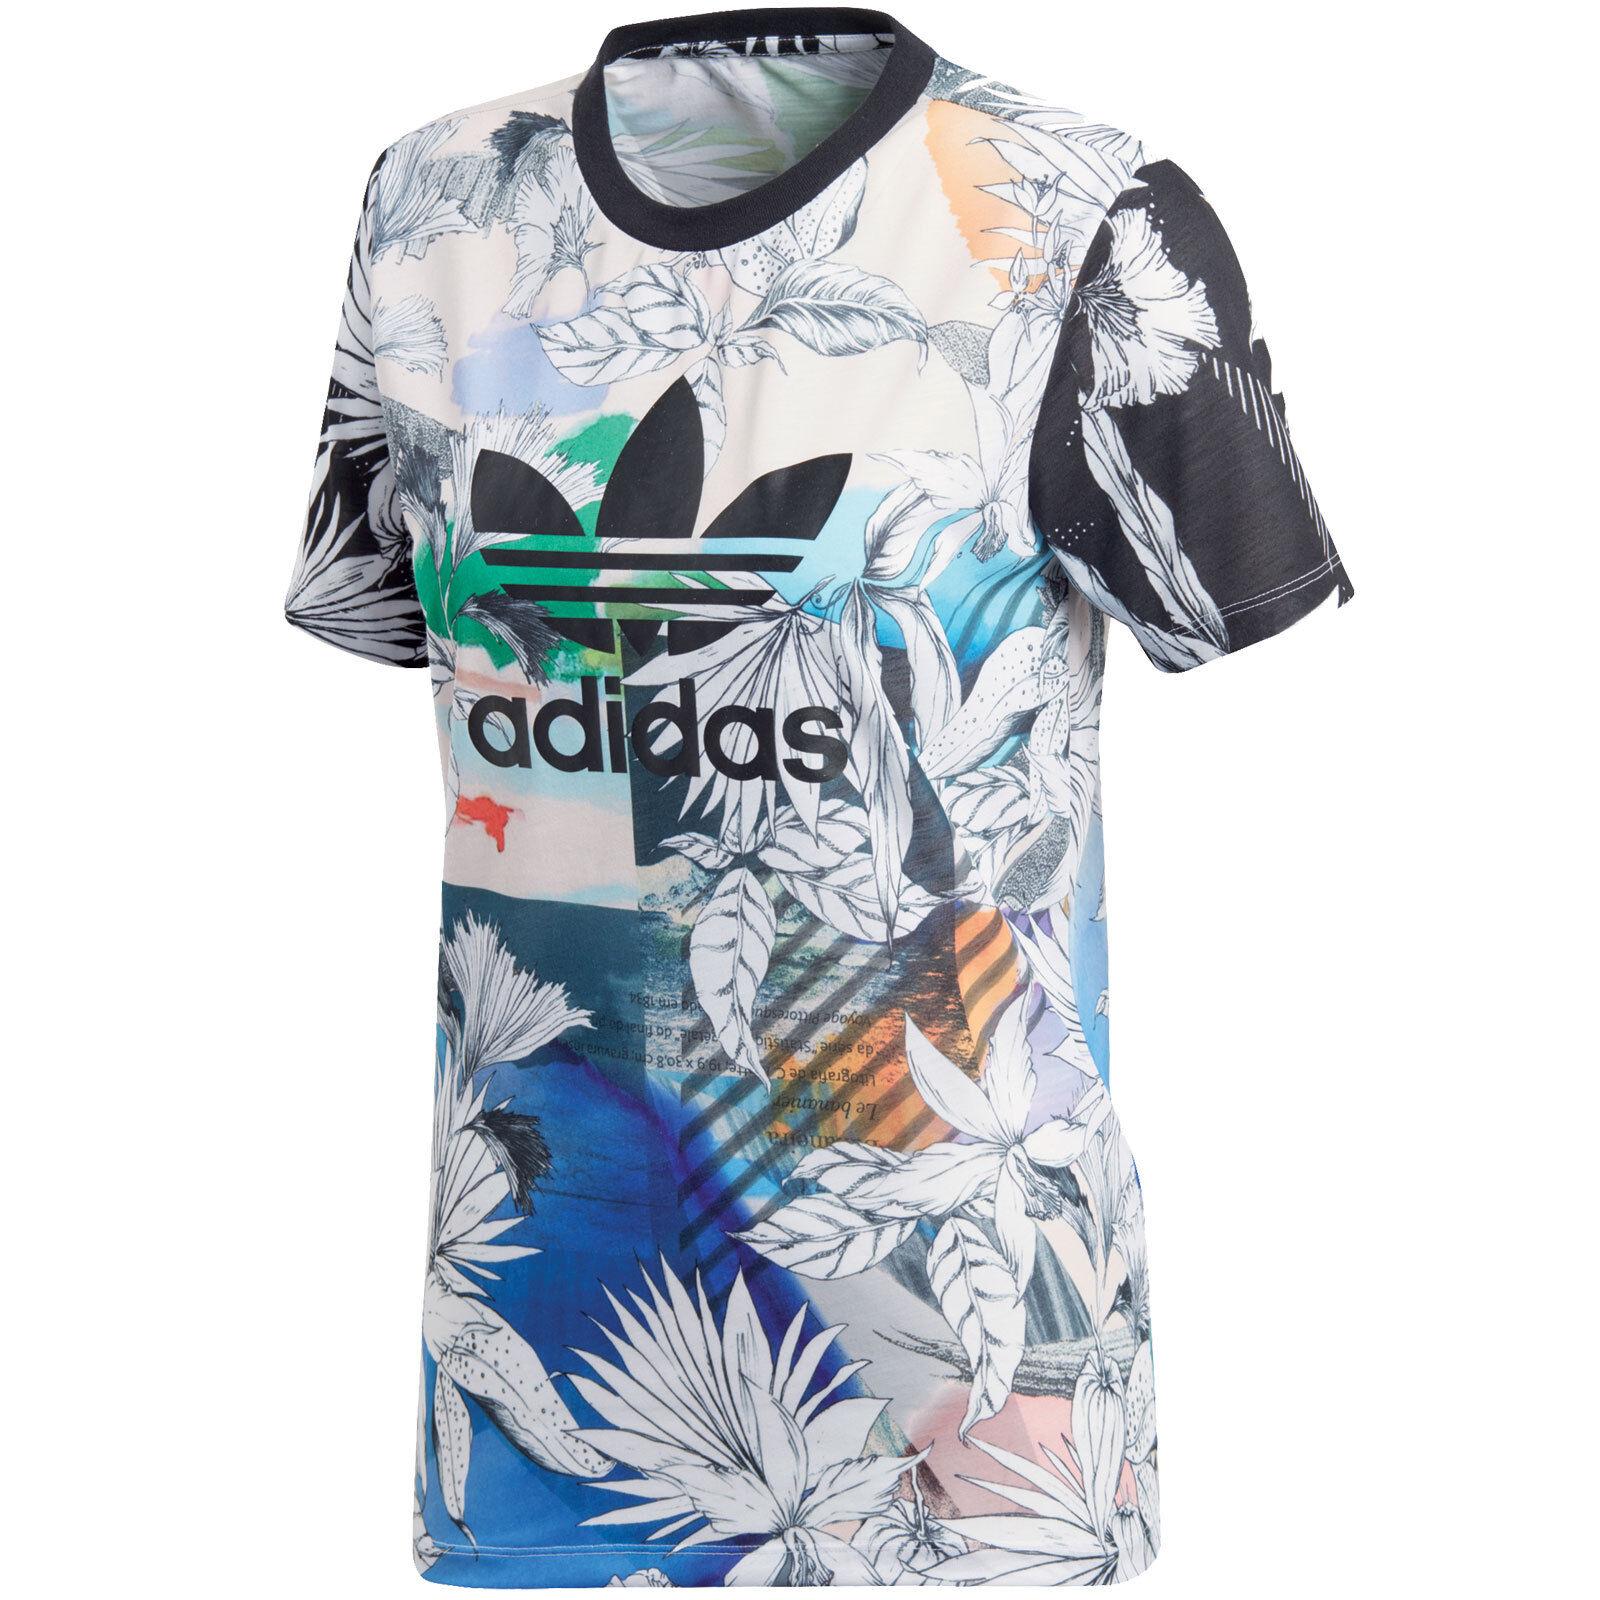 Adidas Originals the Farm Company Tee T-Shirt Women's Top Top